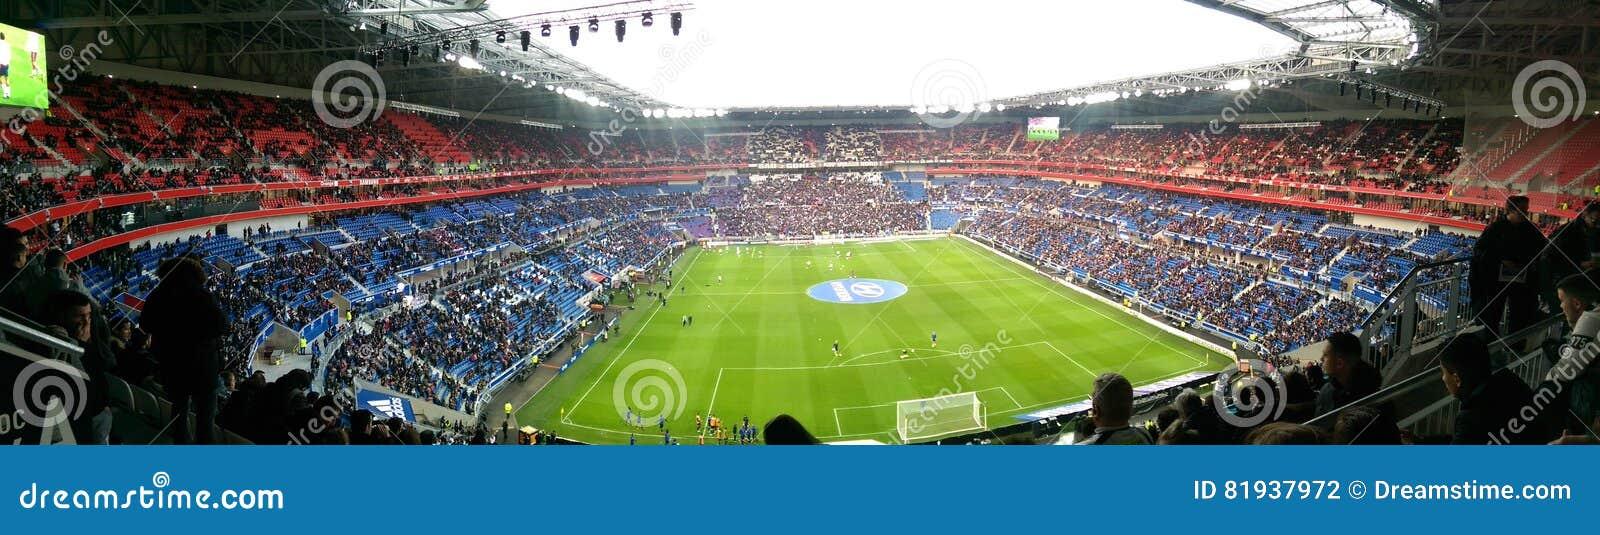 Panoramiczny widok stadium